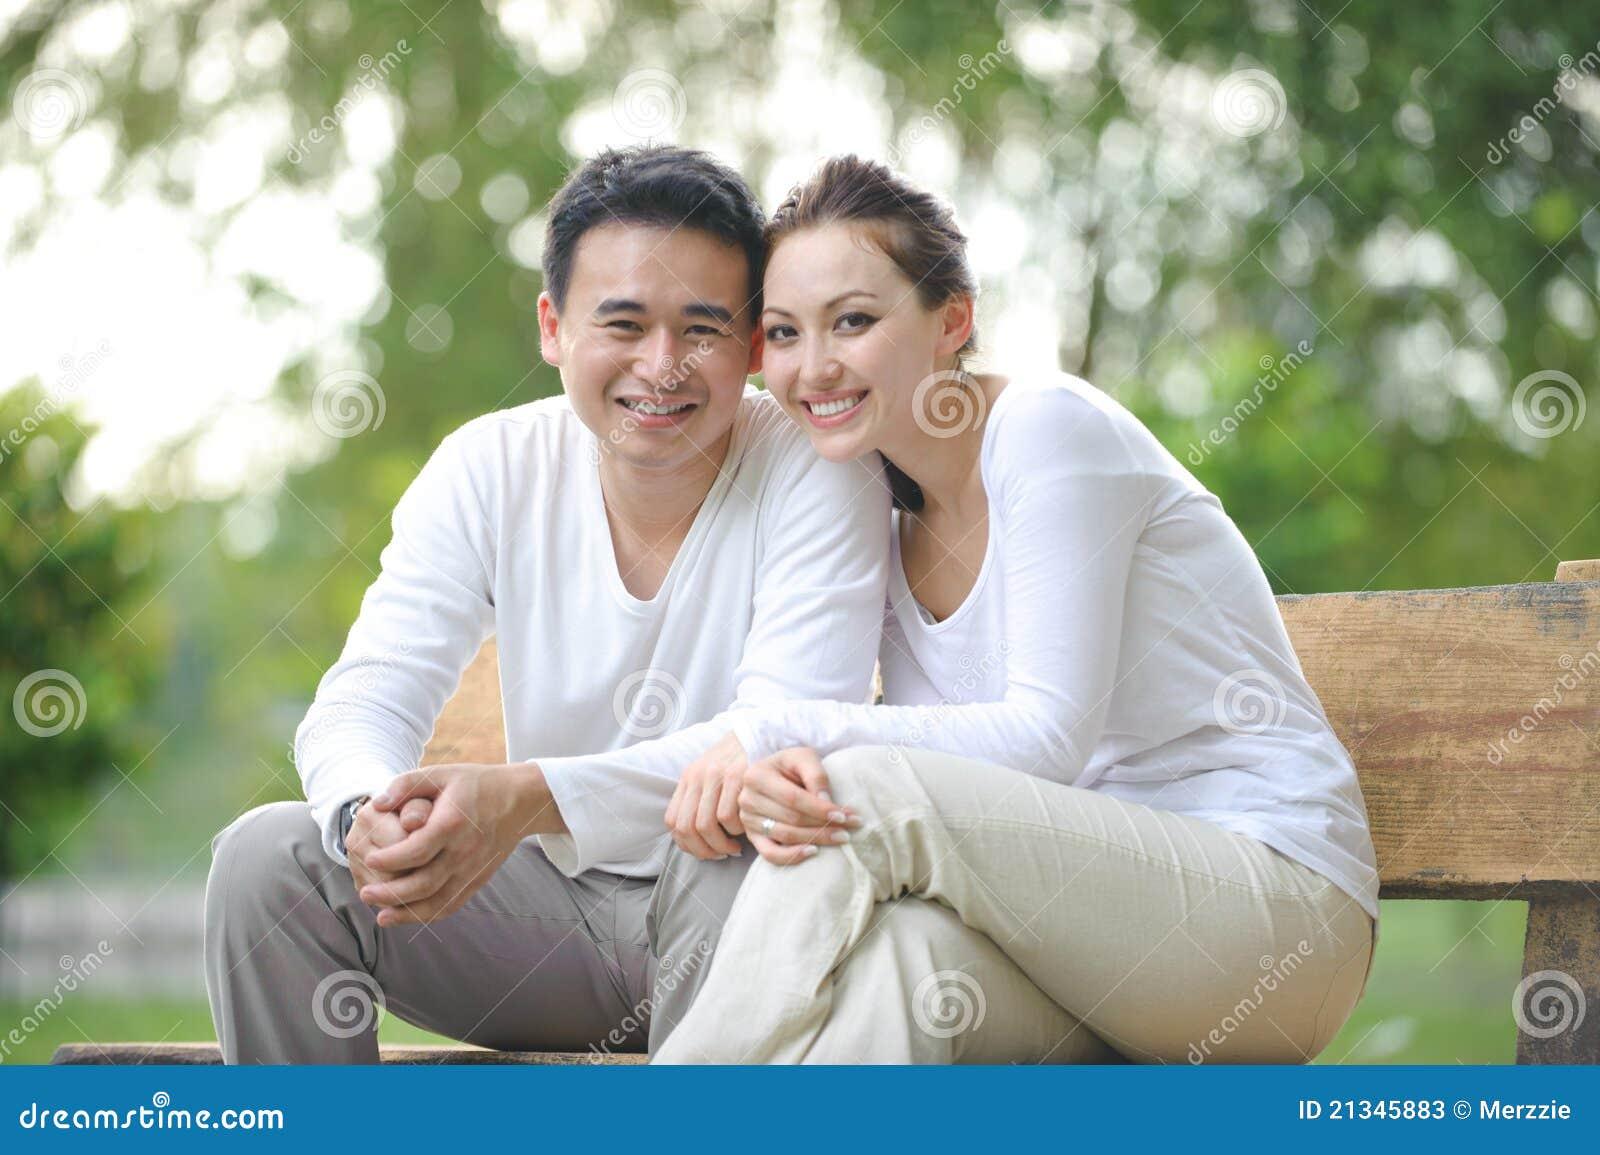 outdoor Woman couple asian